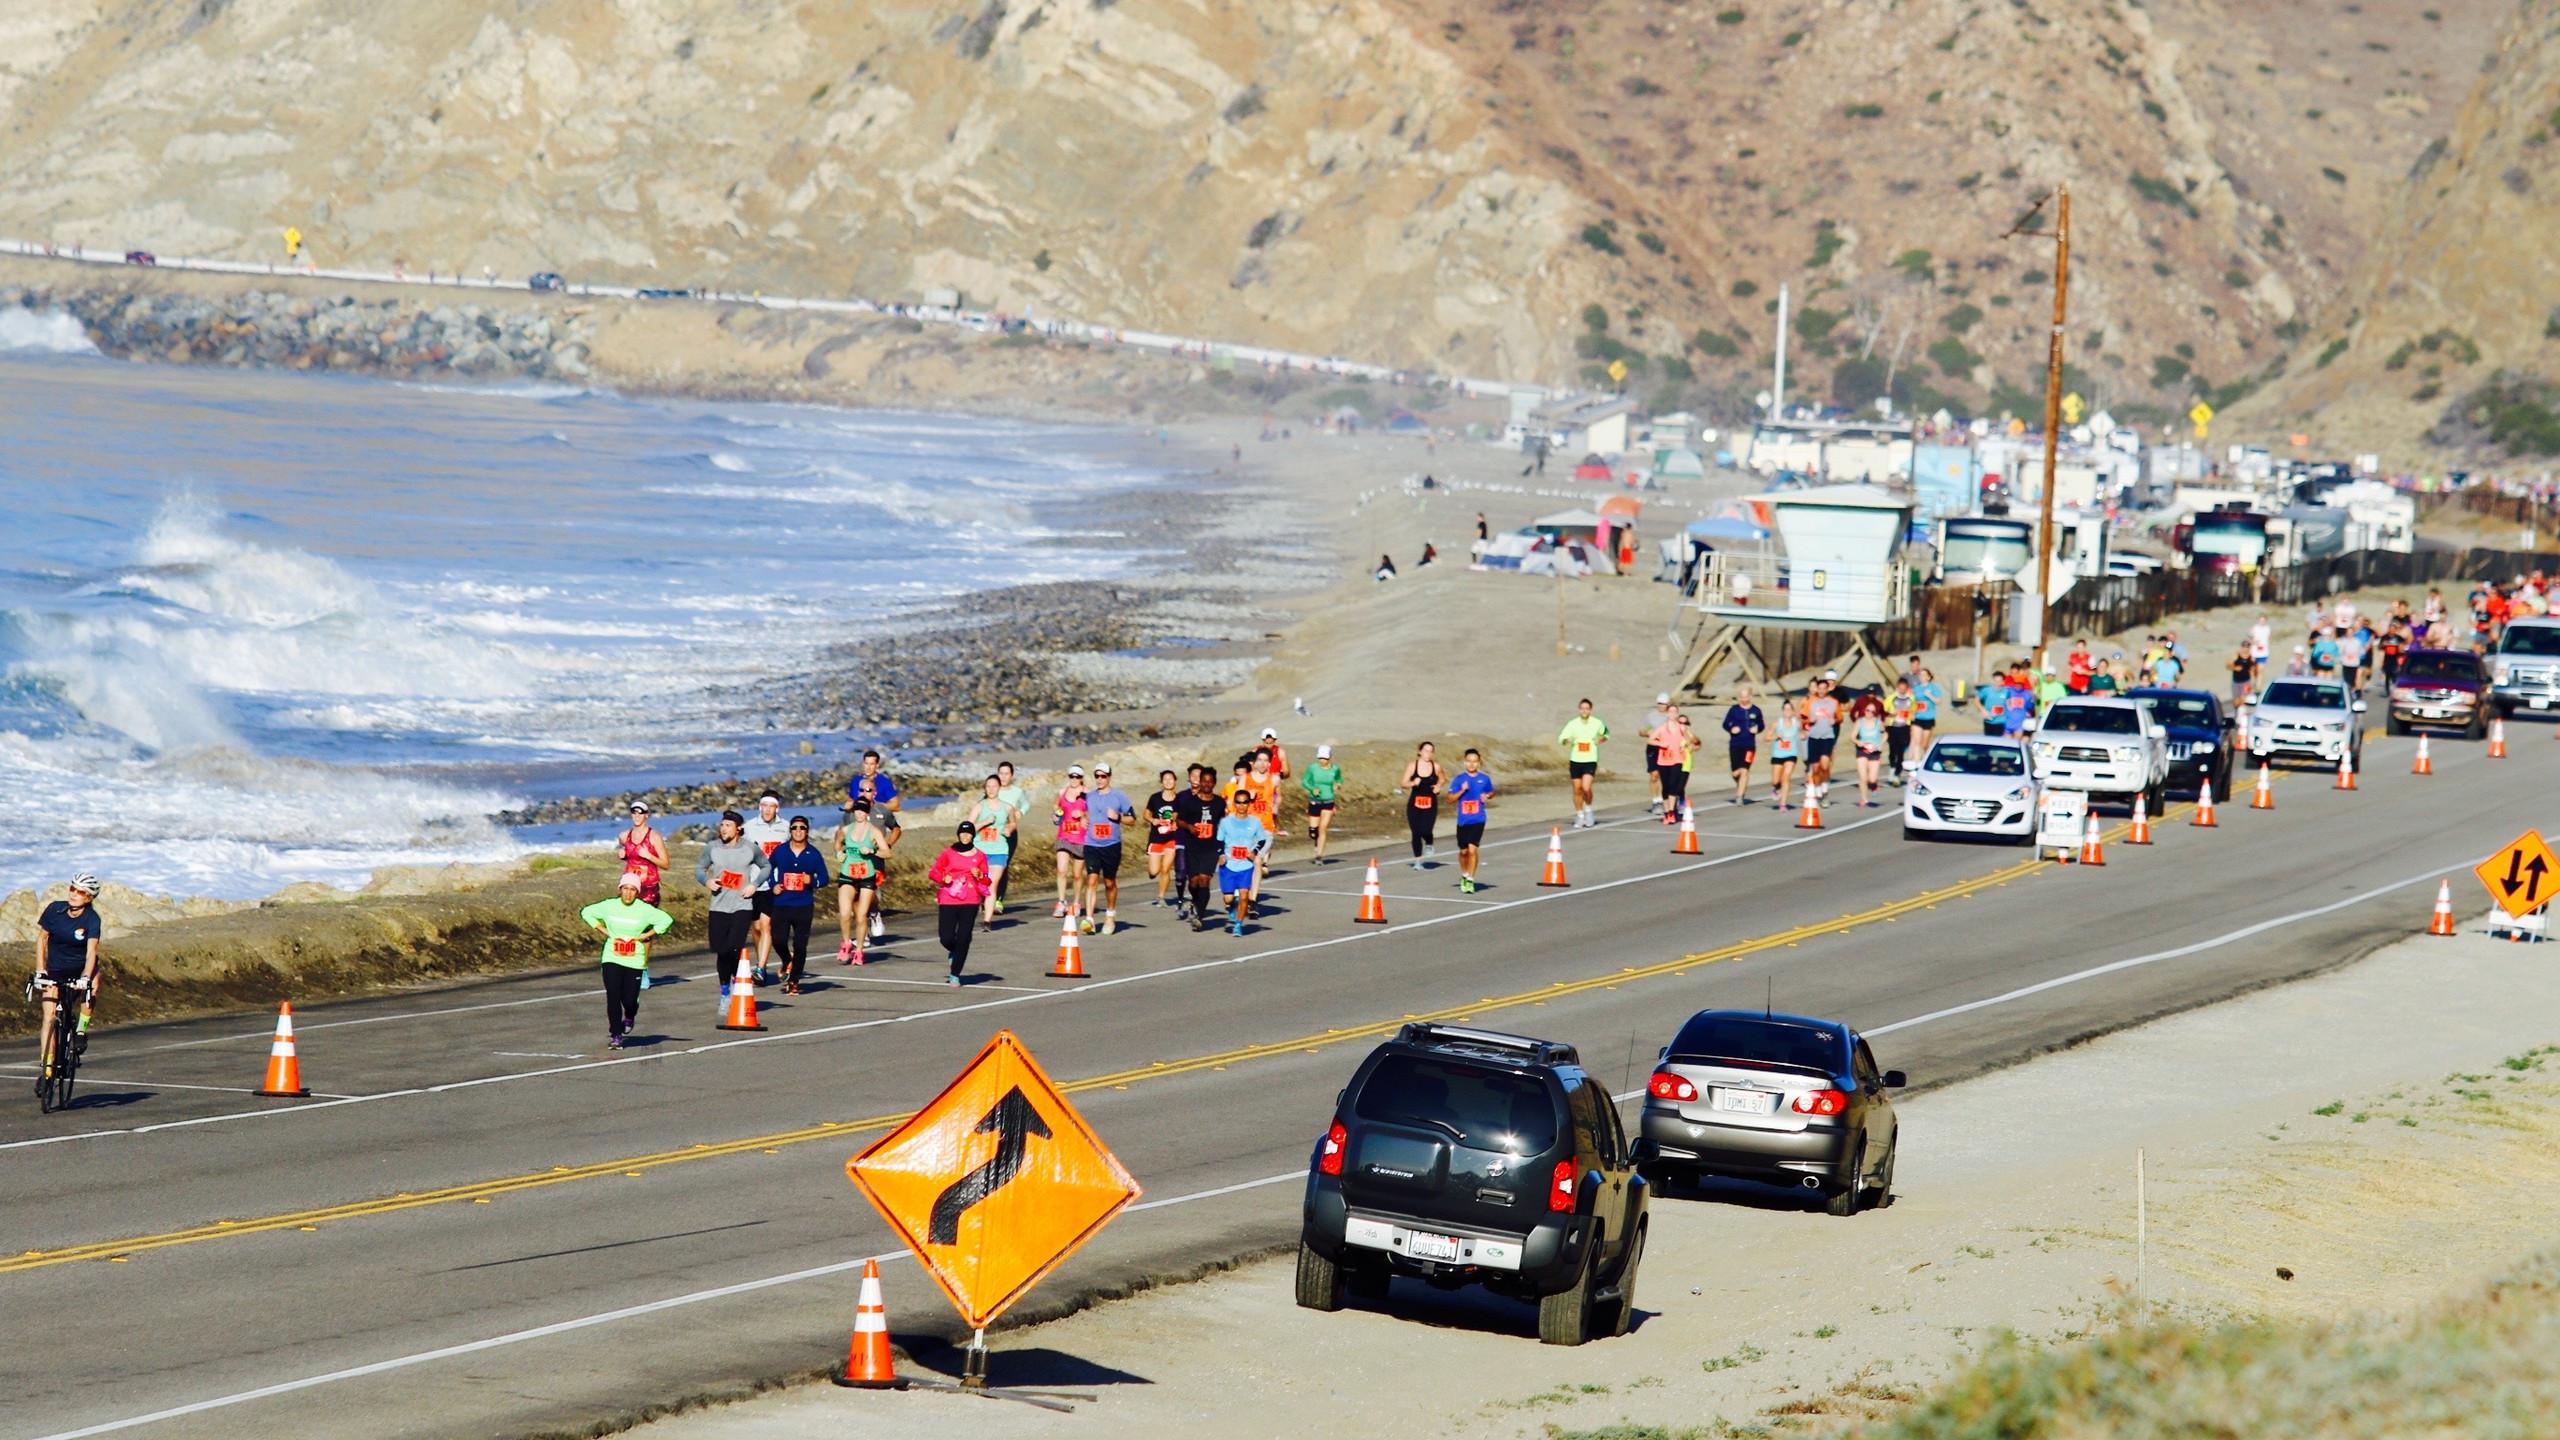 Beautiful views and golden beaches serve as a unique backdrop to the Malibu Half Marathon.